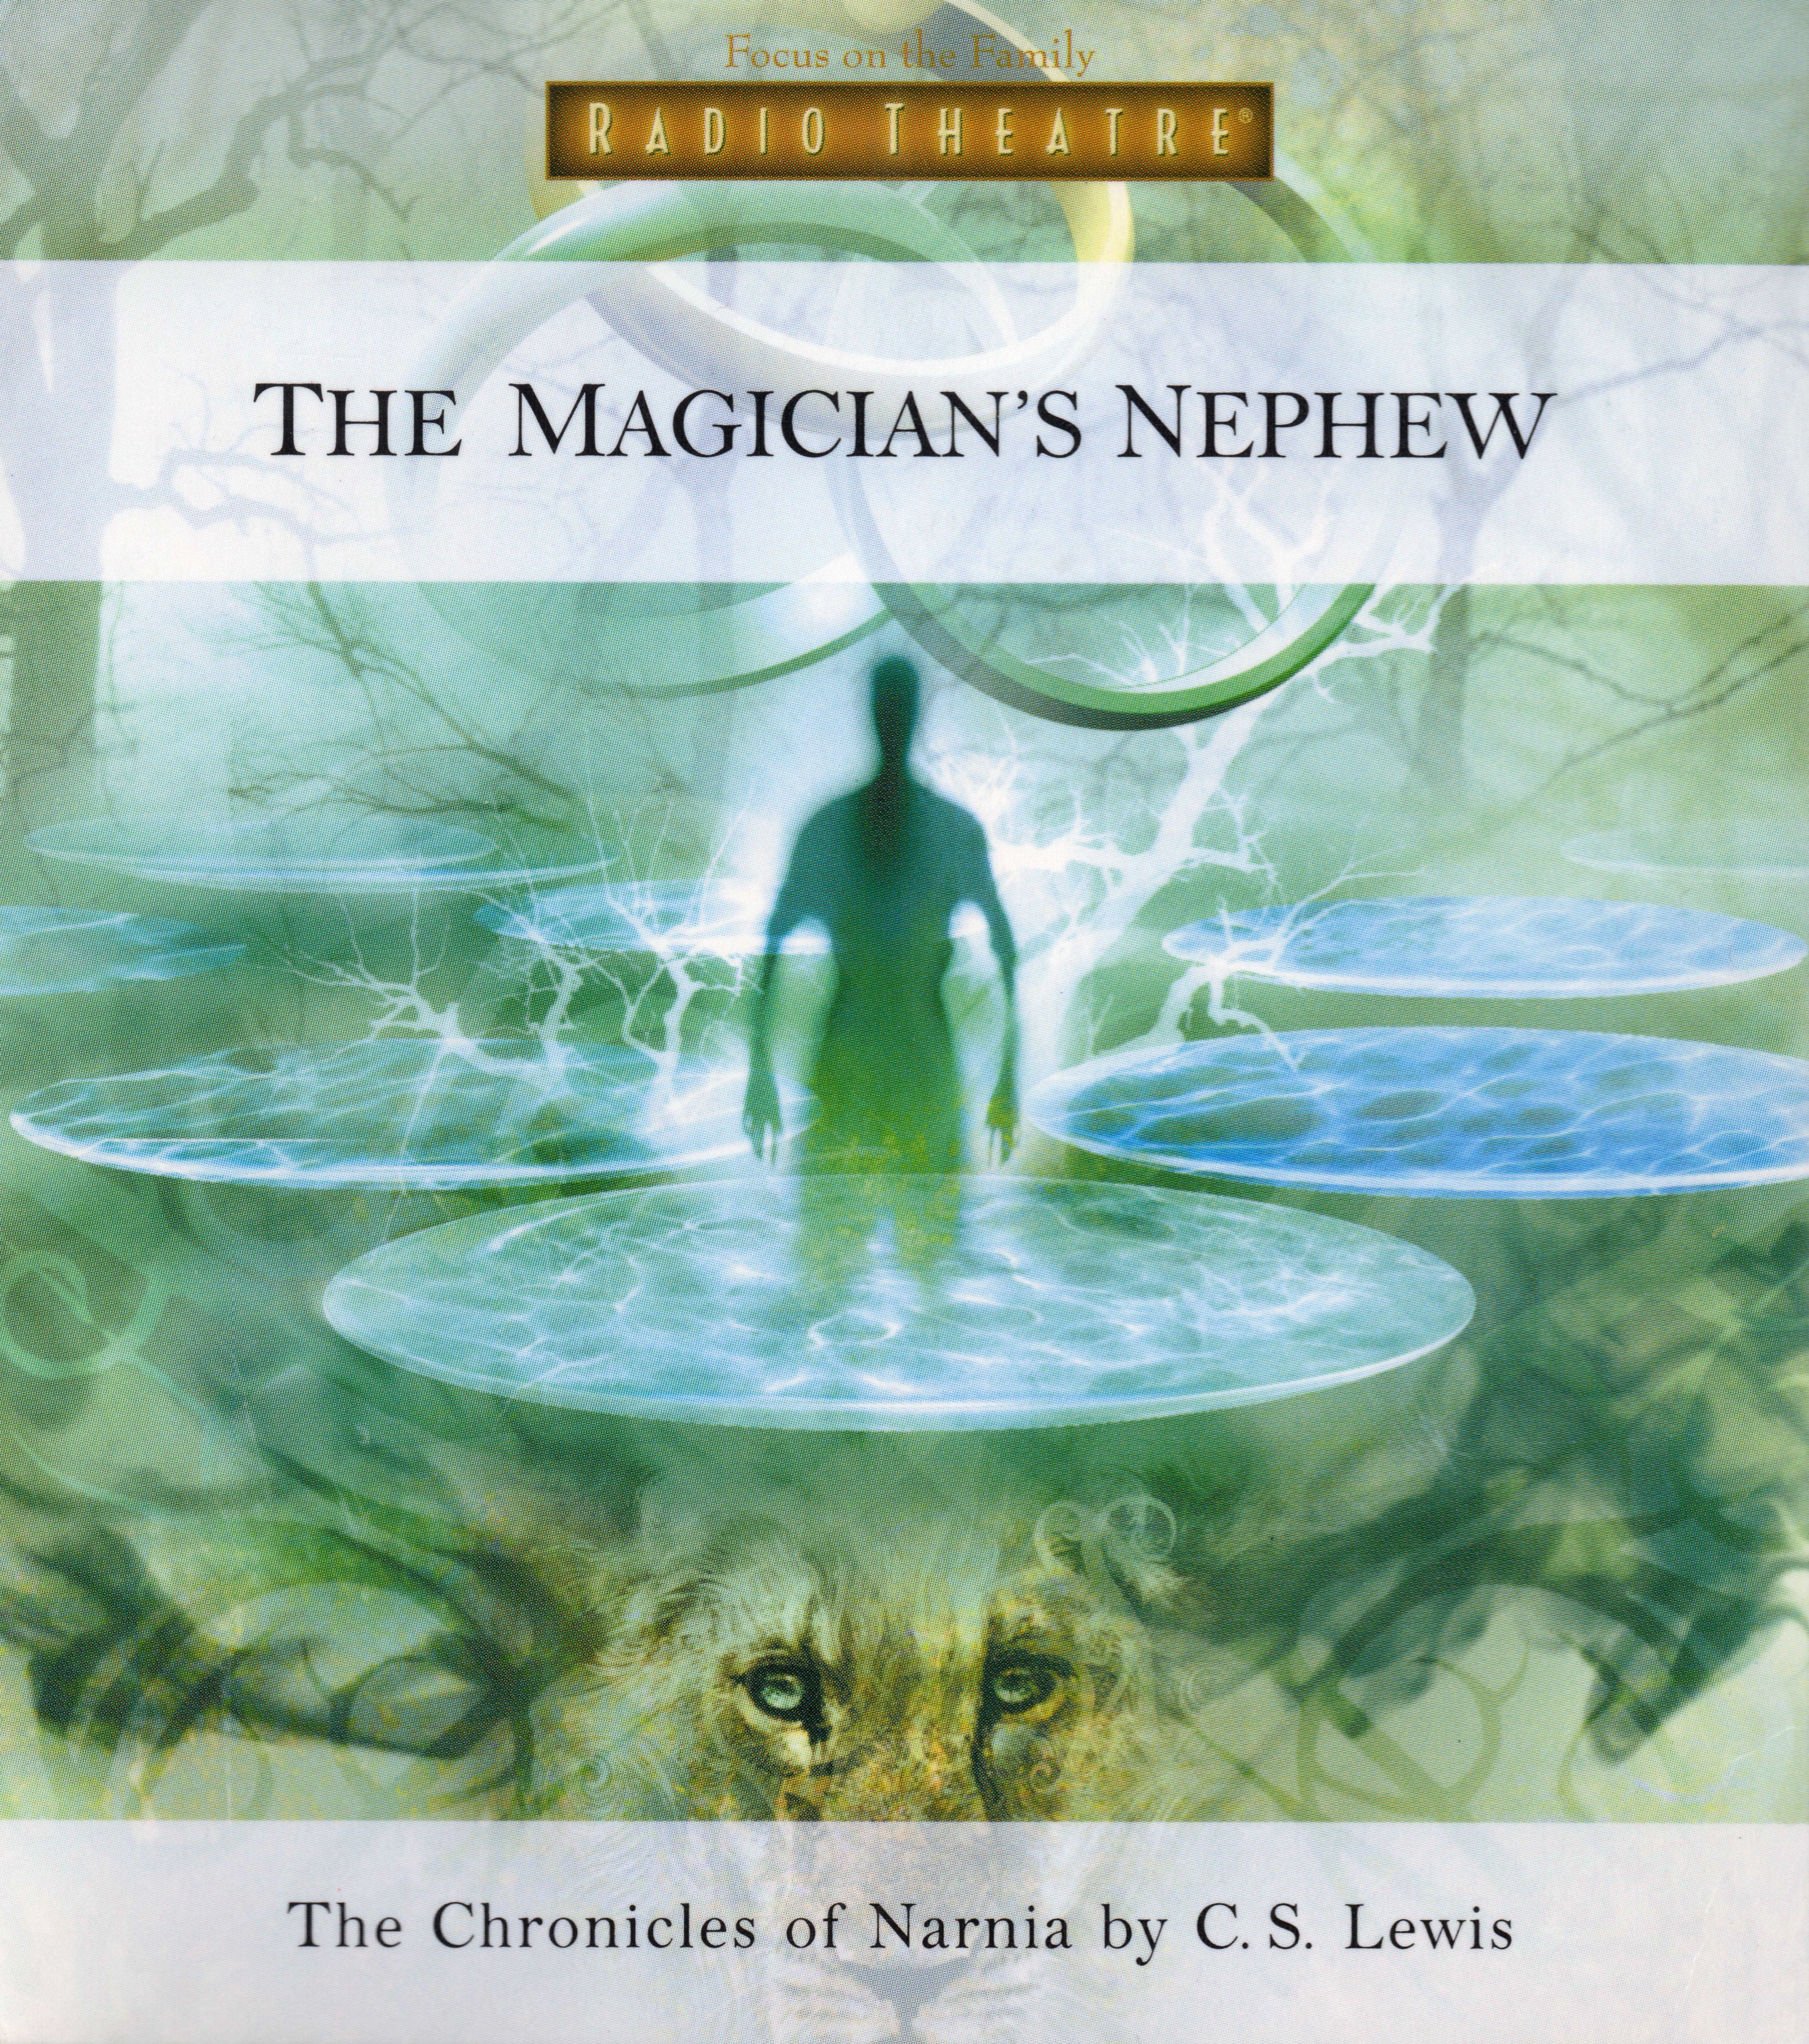 The Magician's Nephew (Focus on the Family Radio Theatre)